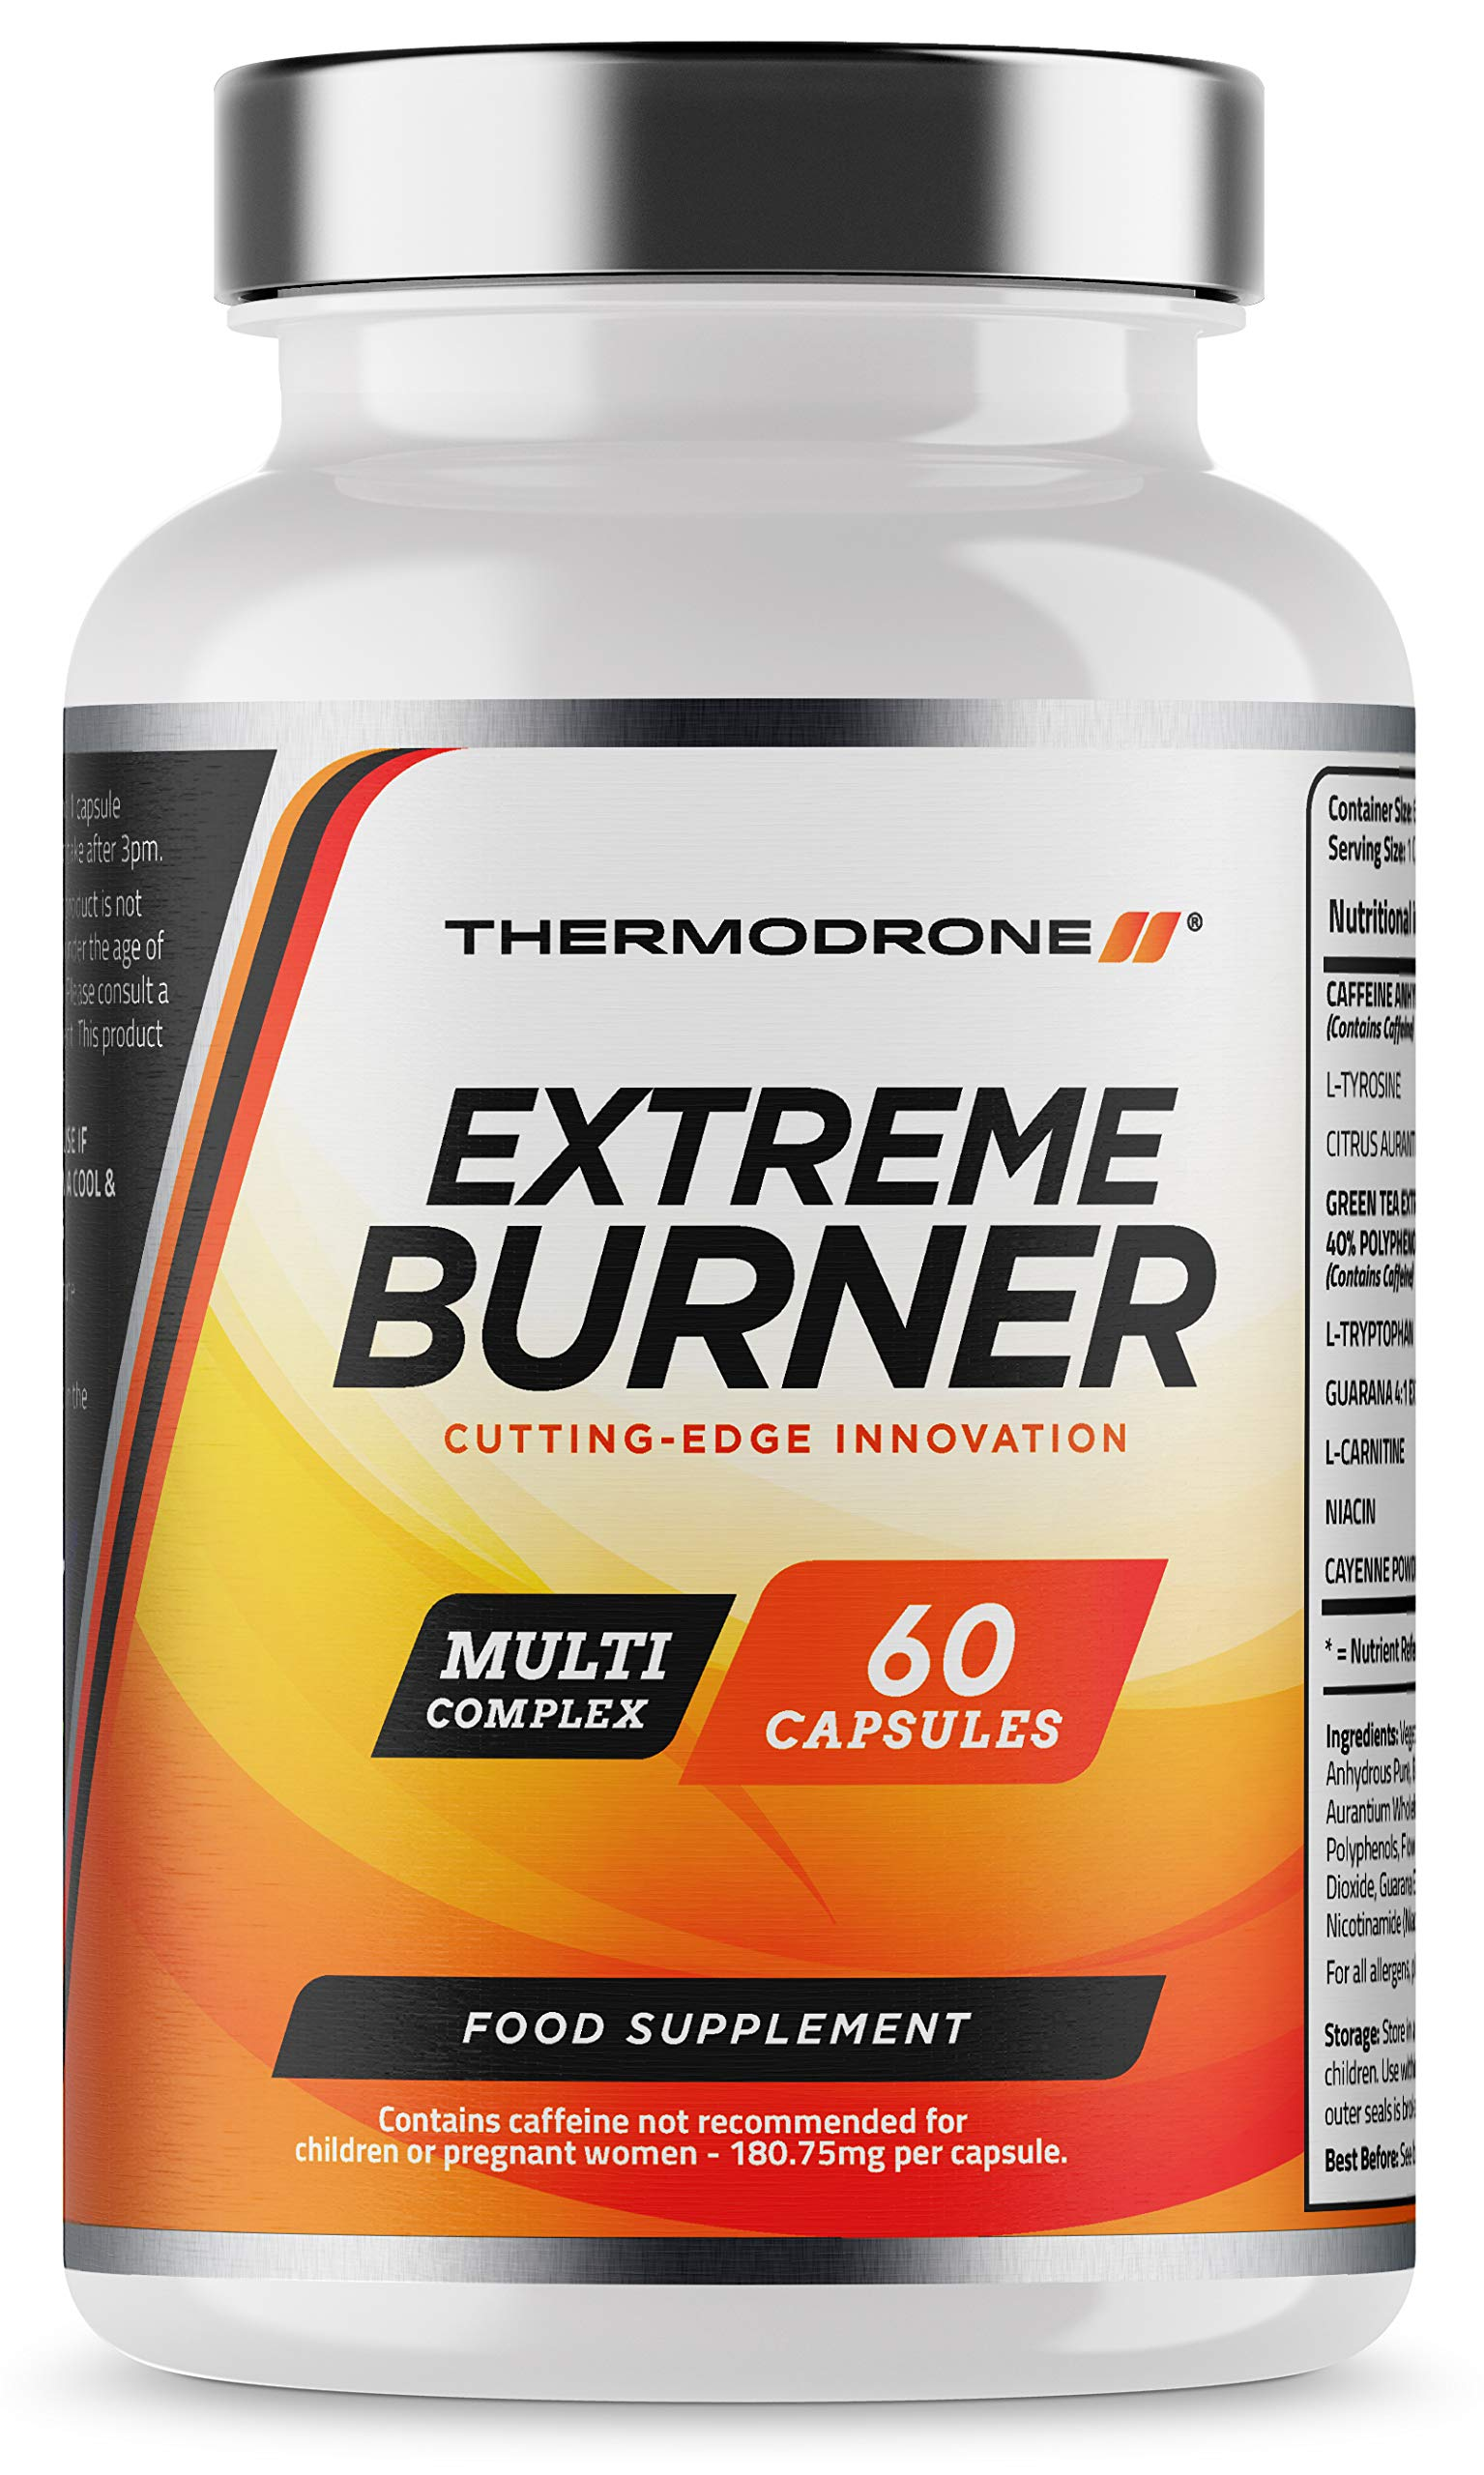 Fat Burners Extreme Fat Burners For Men Women 60 Vegetarian Capsules Uk Manufactured High Strength Premium Safe Legal Fat Burning Pills